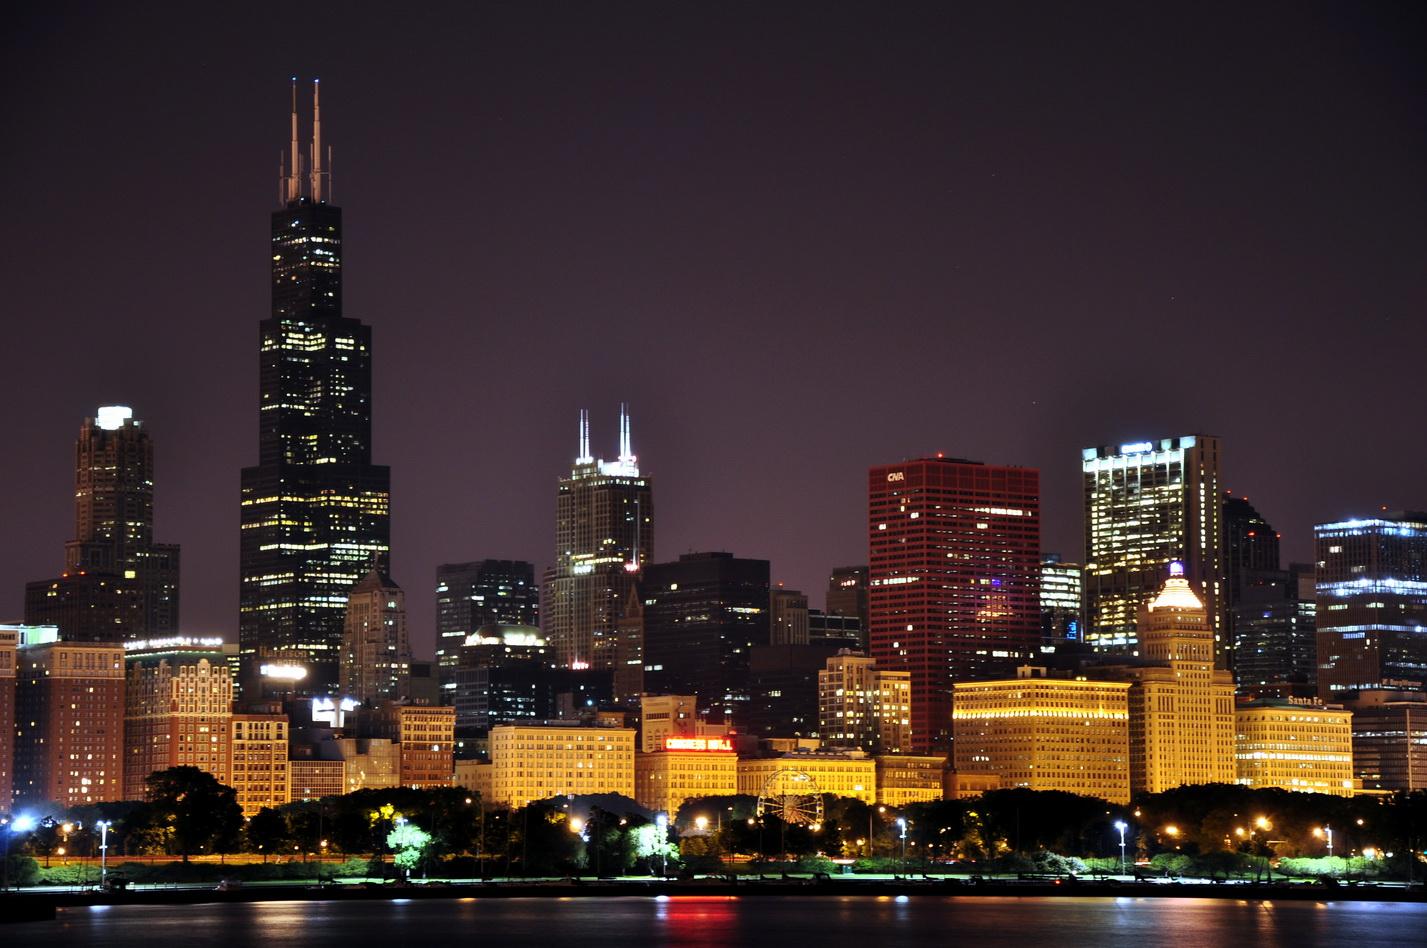 Chicago downtown by SzelpuK 1427x948